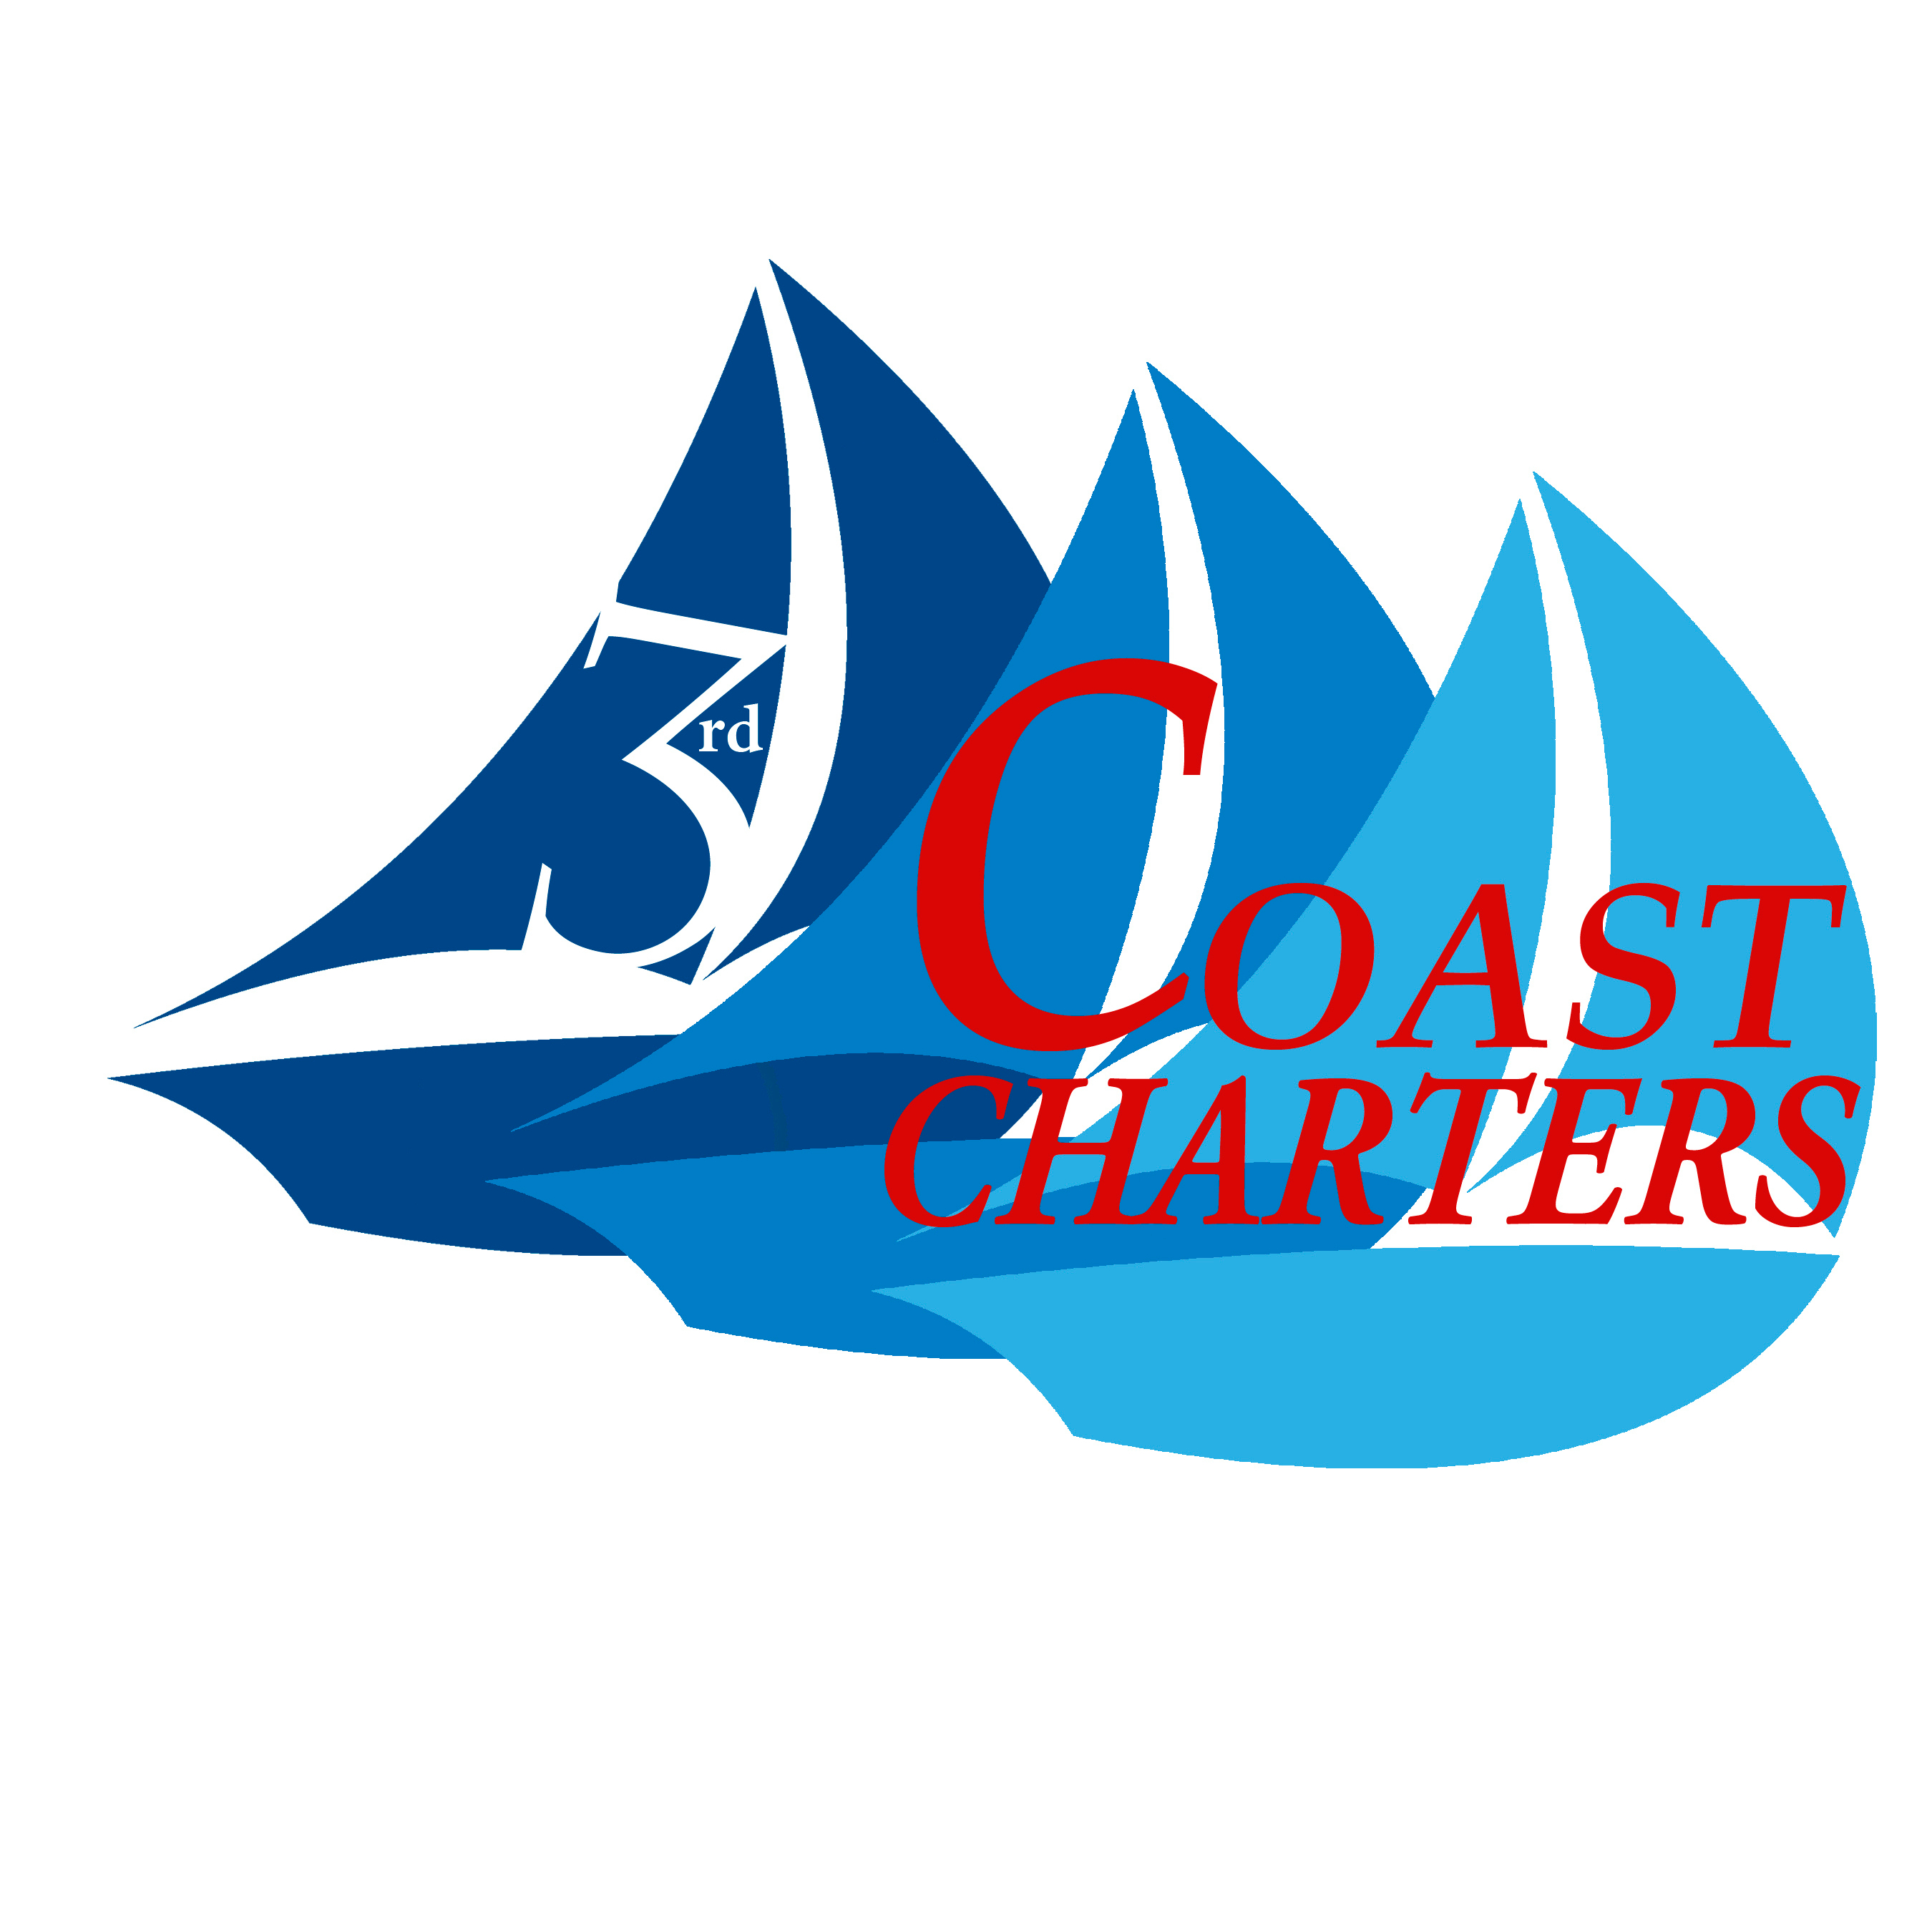 3rd Coast Charters image 2